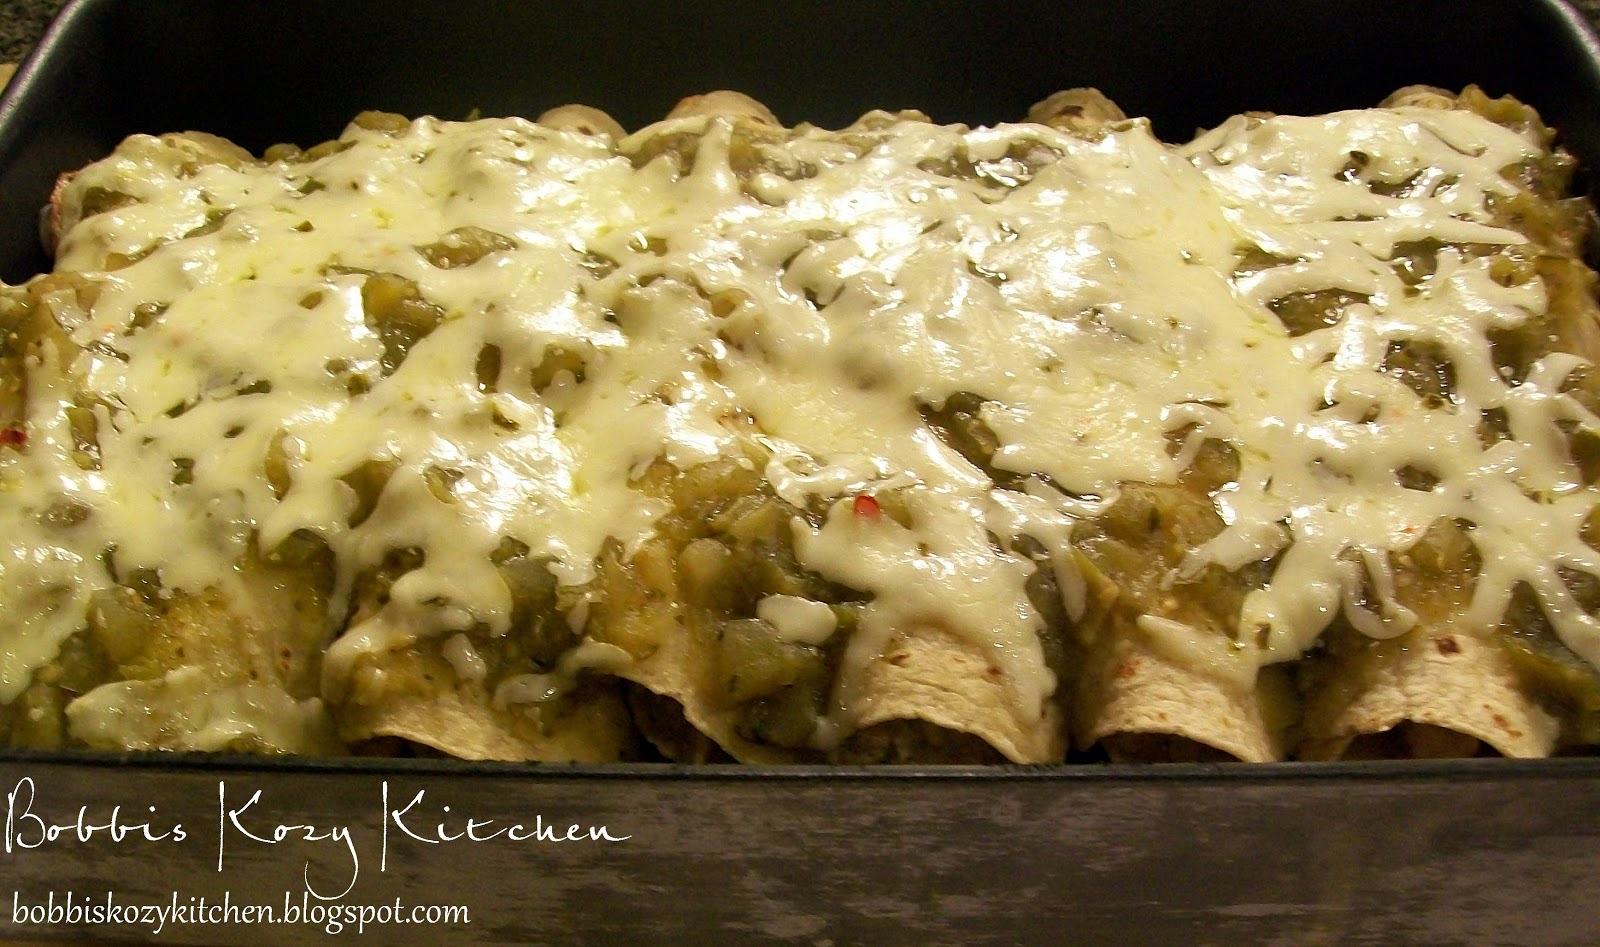 Bobbi's Kozy Kitchen: Chicken Enchiladas with Chili Verde Sauce